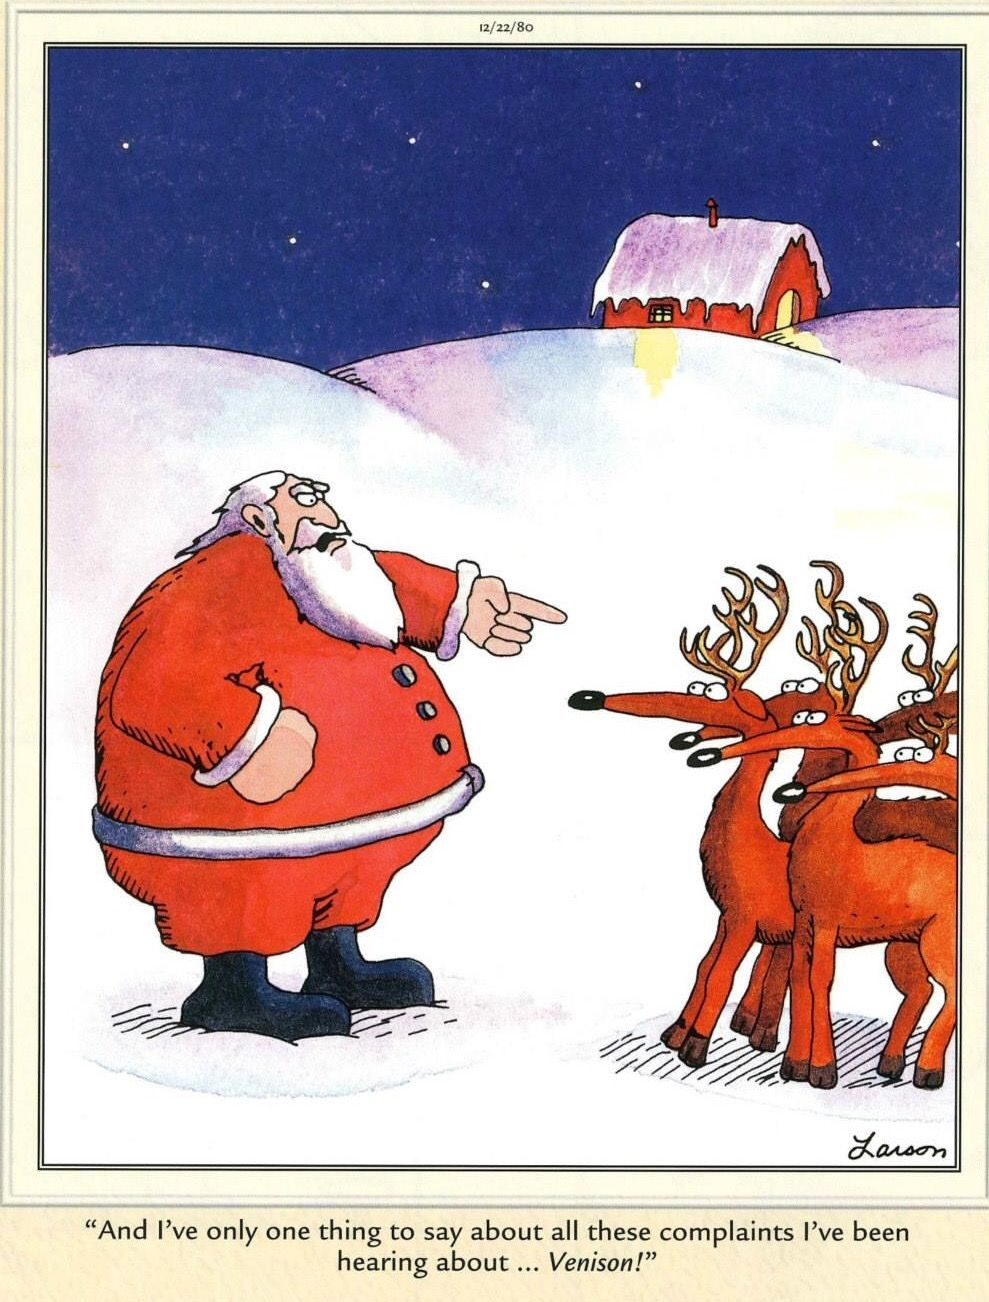 Far Side Christmas Cartoons : christmas, cartoons, Dagmar, Wagner, Cartoons, Christmas, Humor,, Larson, Cartoons,, Funny